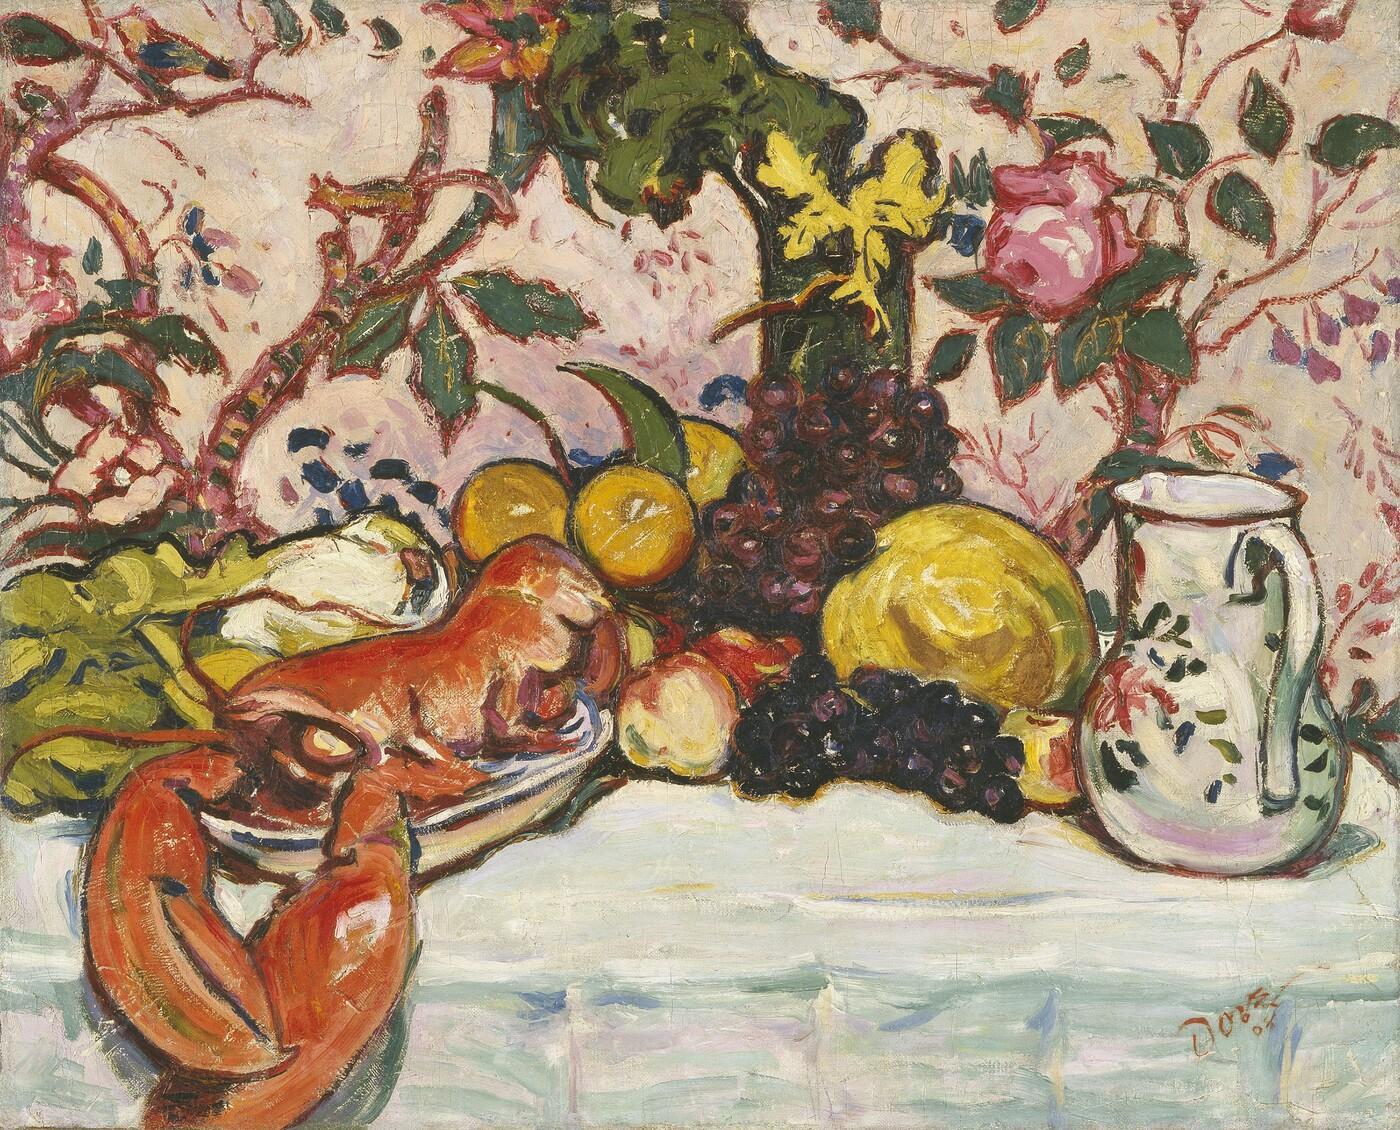 Arthur Dorve, The Lobster, 1908